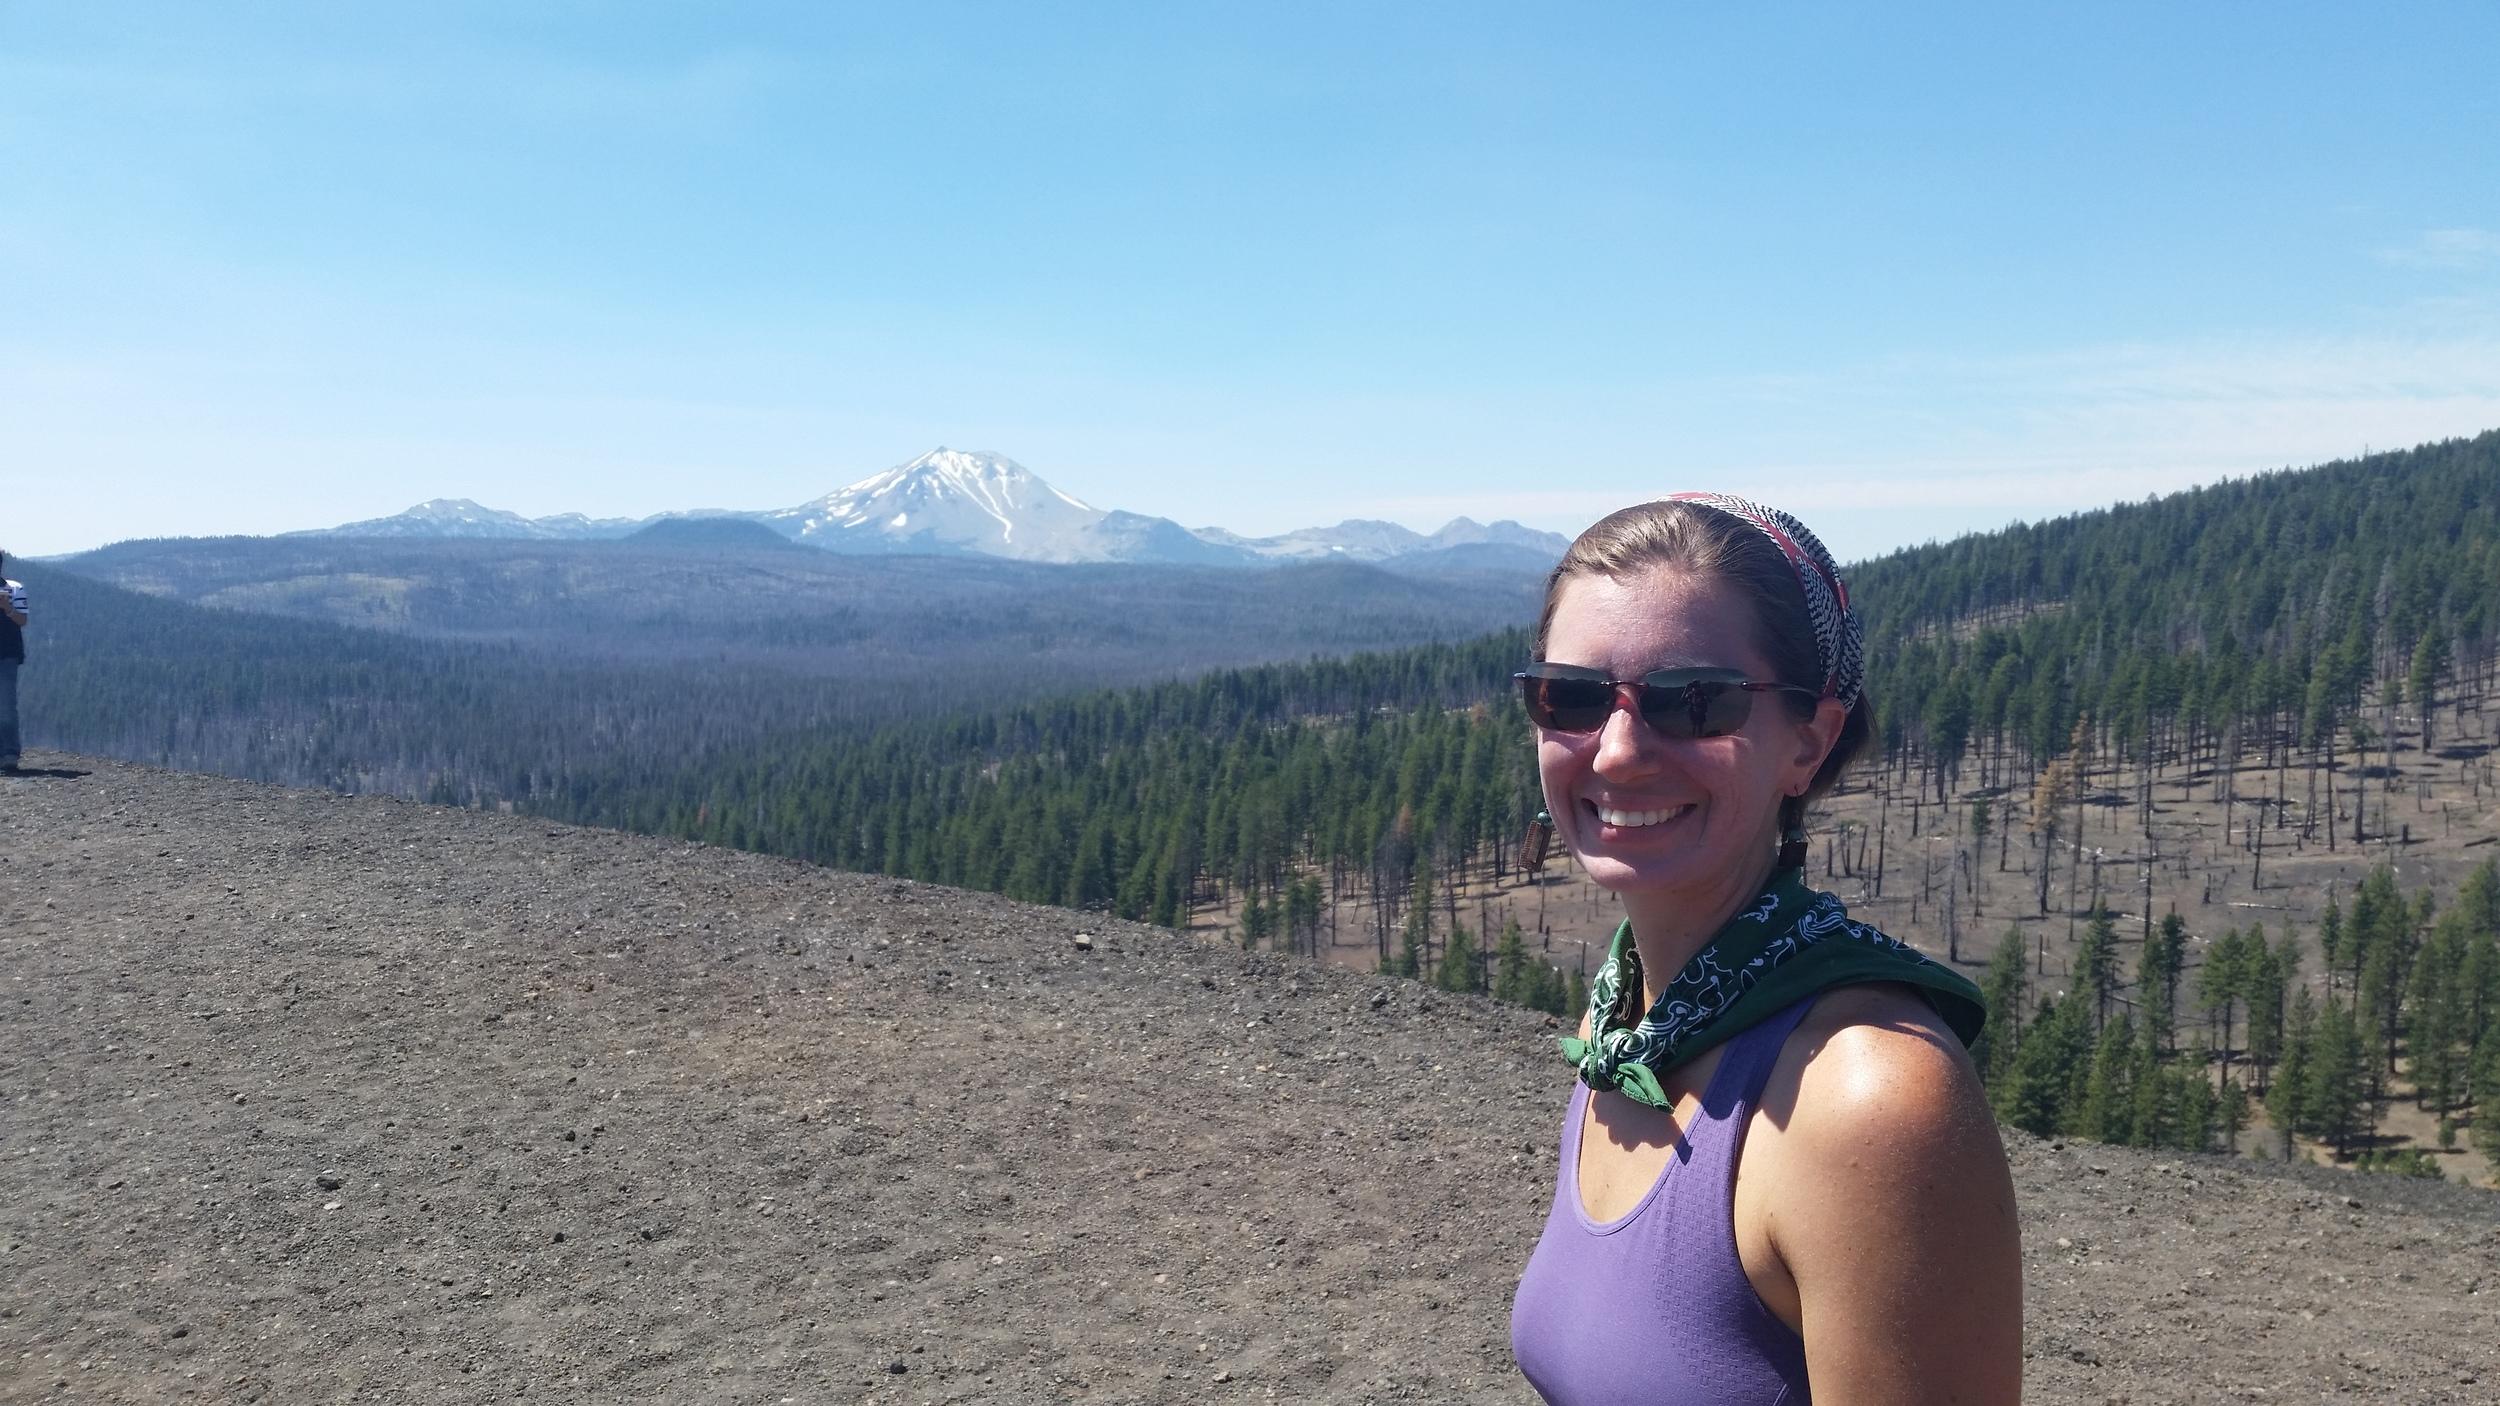 Alli at the top of Cinder Cone, enjoying views of Lassen Peak.